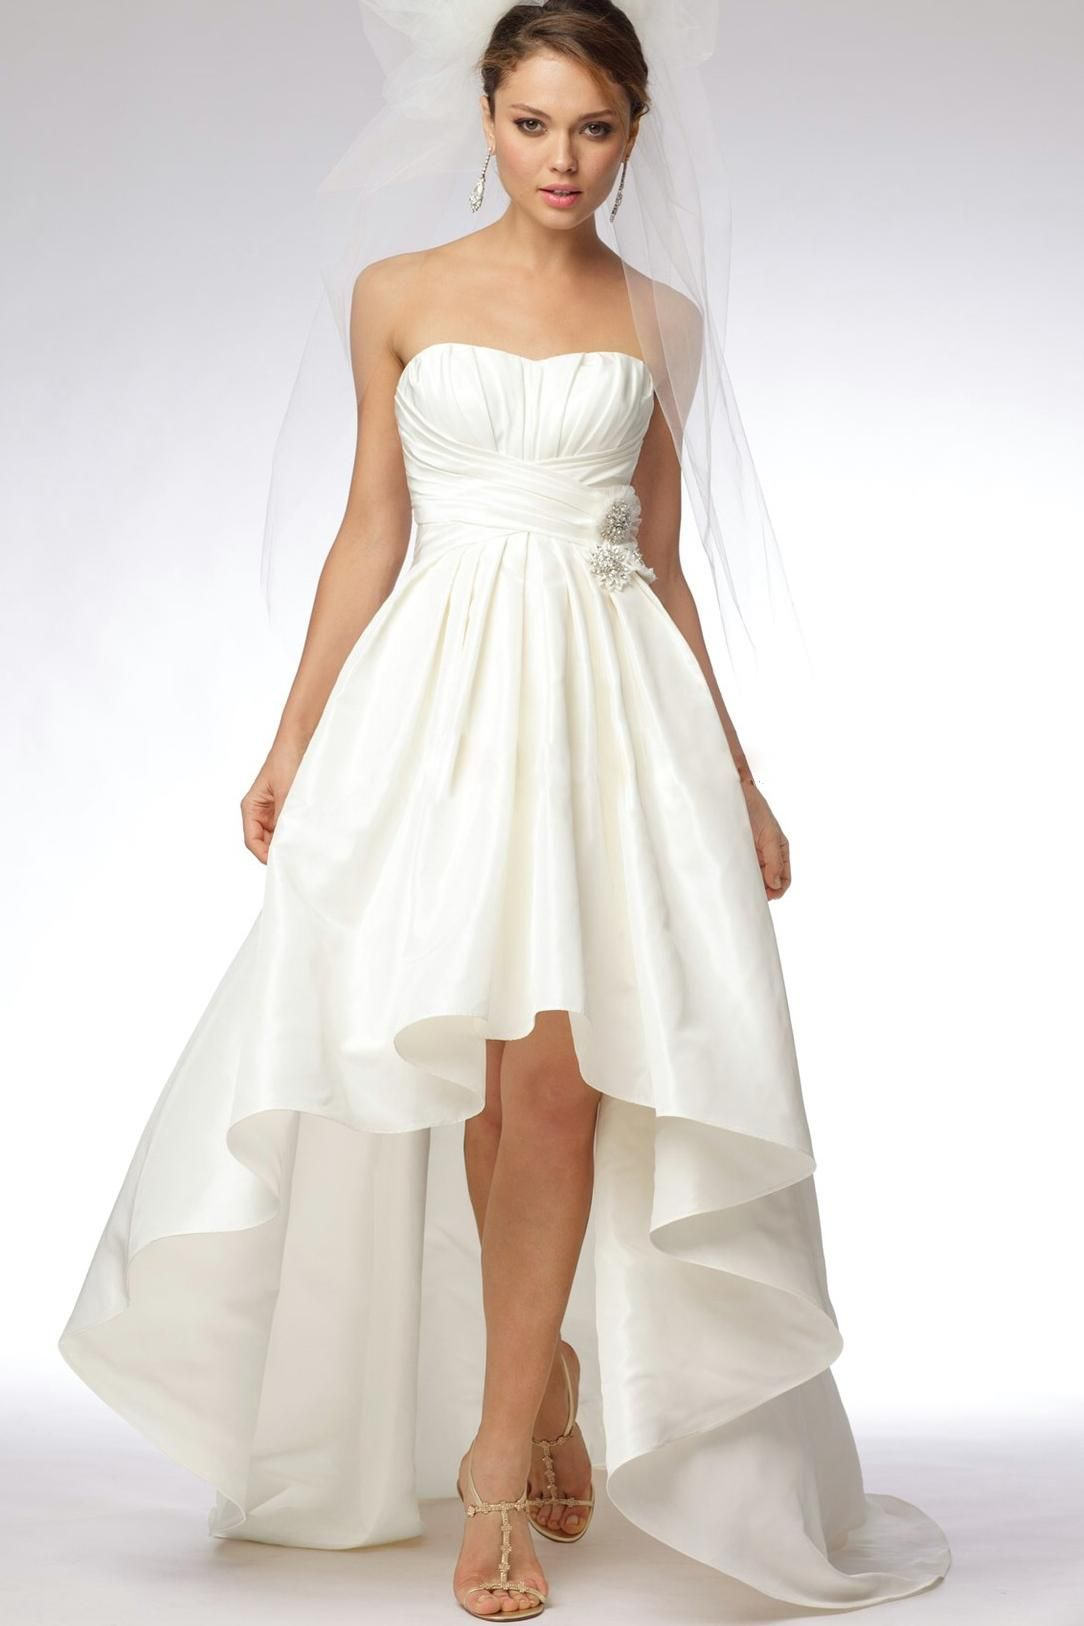 Alineprincess strapless court taffeta bridal gowns orvztoe